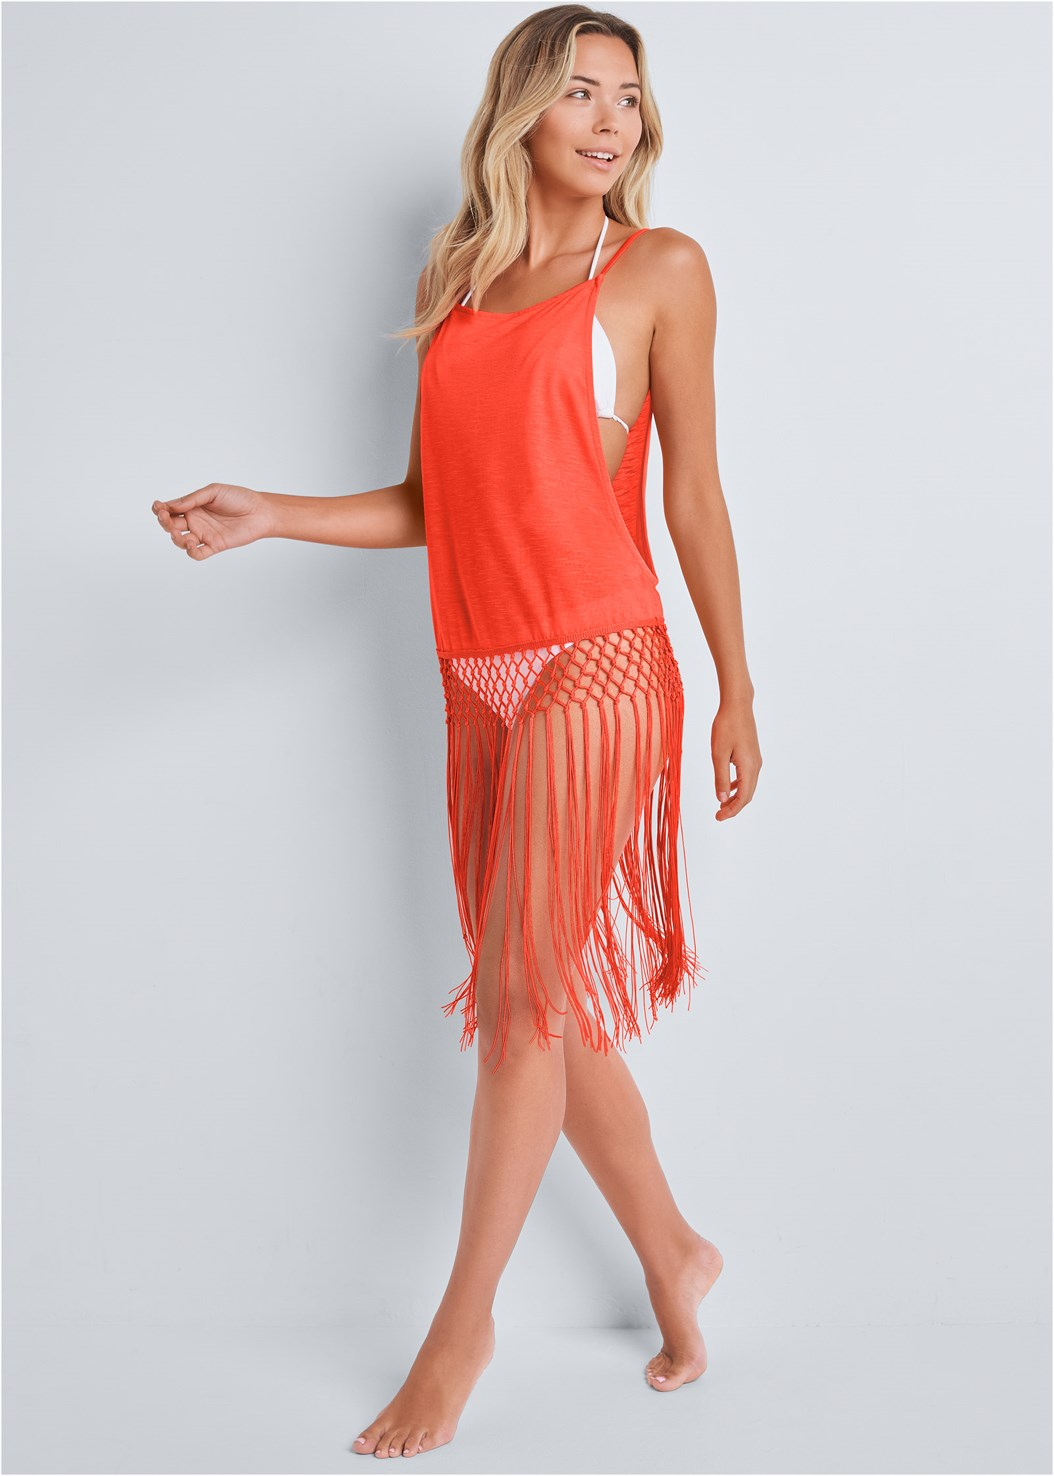 Fringe Tunic Cover-Up,Triangle String Bikini Top,Scoop Front Classic Bikini Bottom ,Embellished Slides